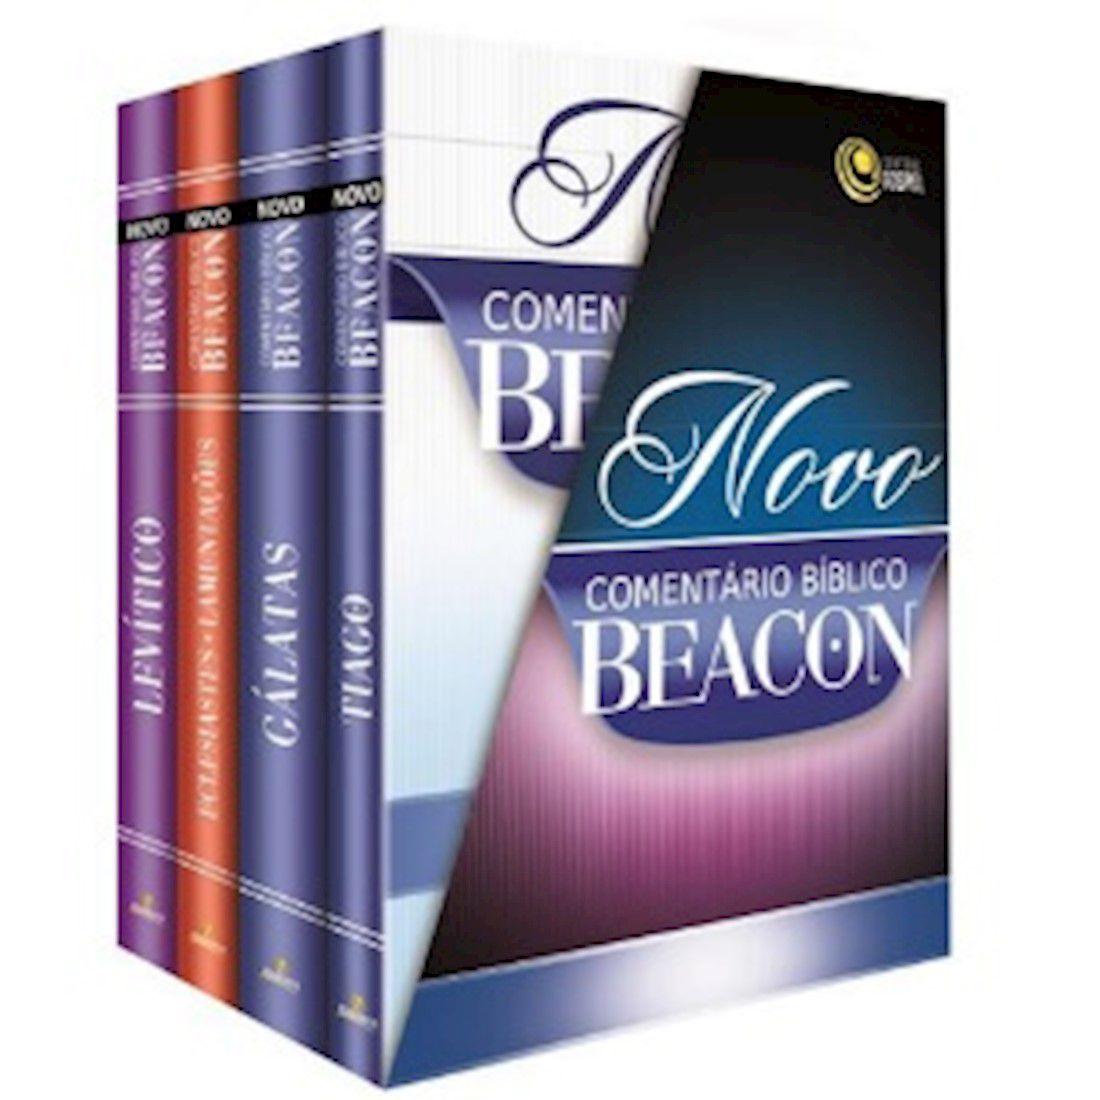 Novo Comentário Bíblico Beacon Vol 02